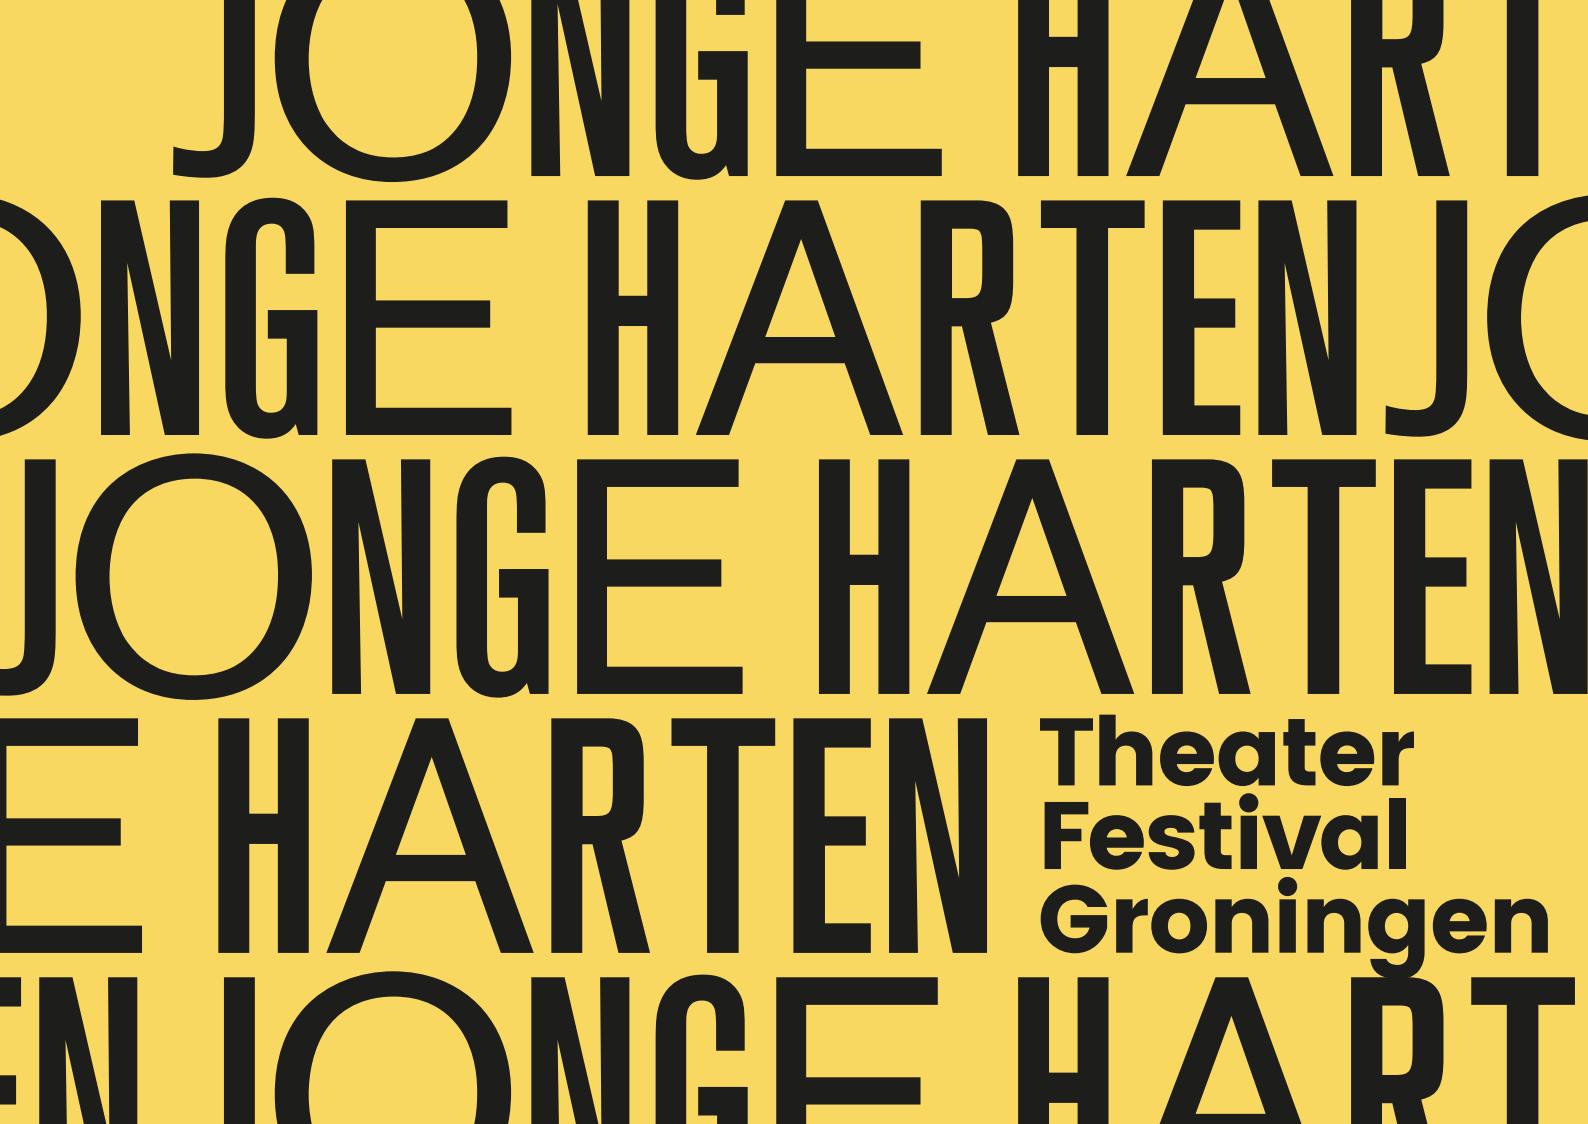 Jonge Harten Theaterfestival 19 t/m 27 november